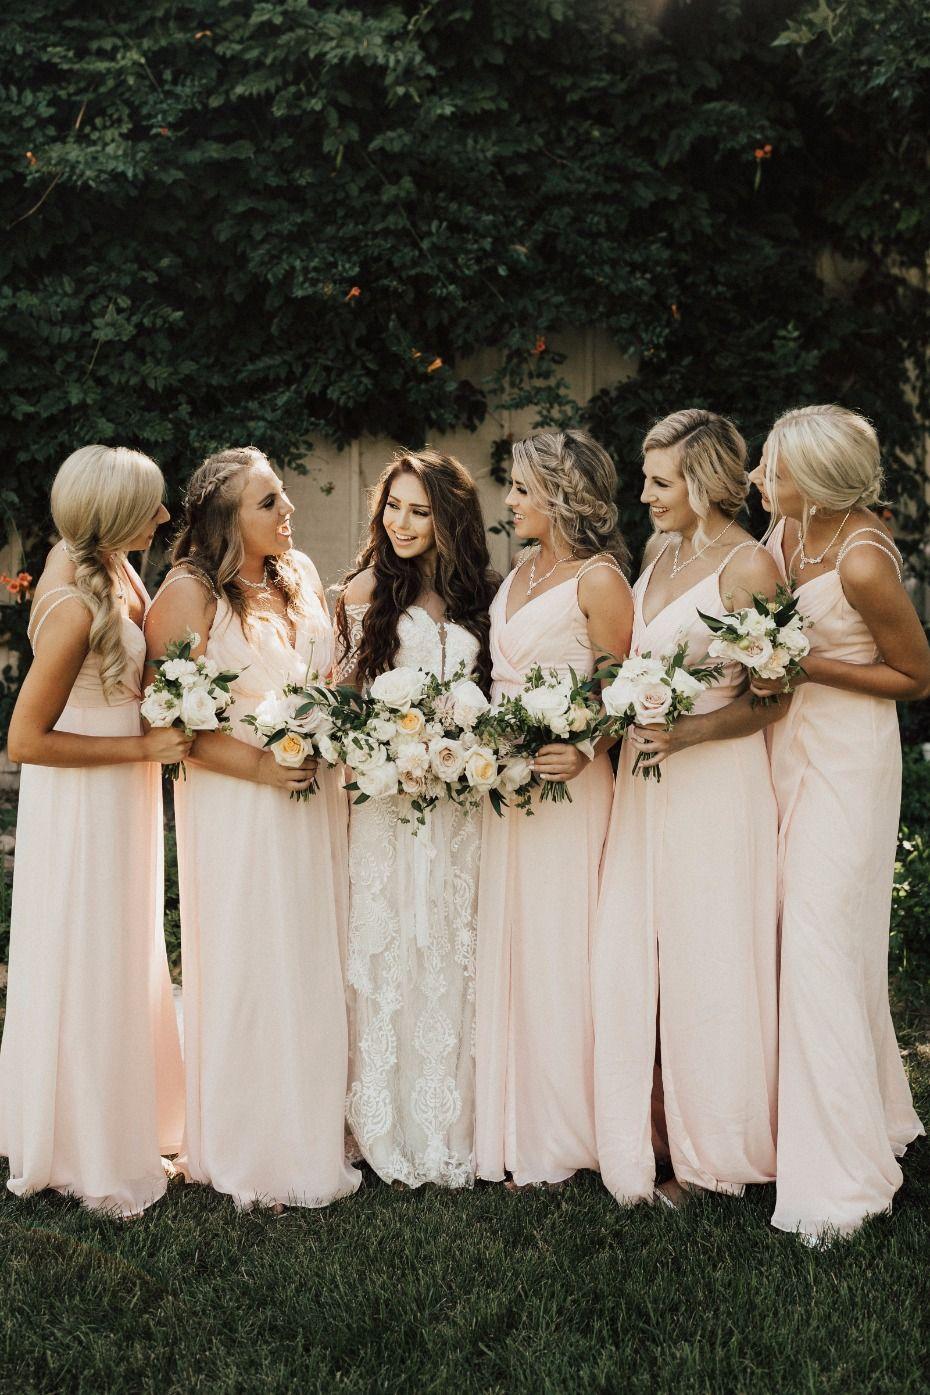 Our 15k Rustic Chic Idaho Wedding Peach Bridesmaid Dresses Rustic Bridesmaid Dresses Peach Bridesmaid [ 1395 x 930 Pixel ]